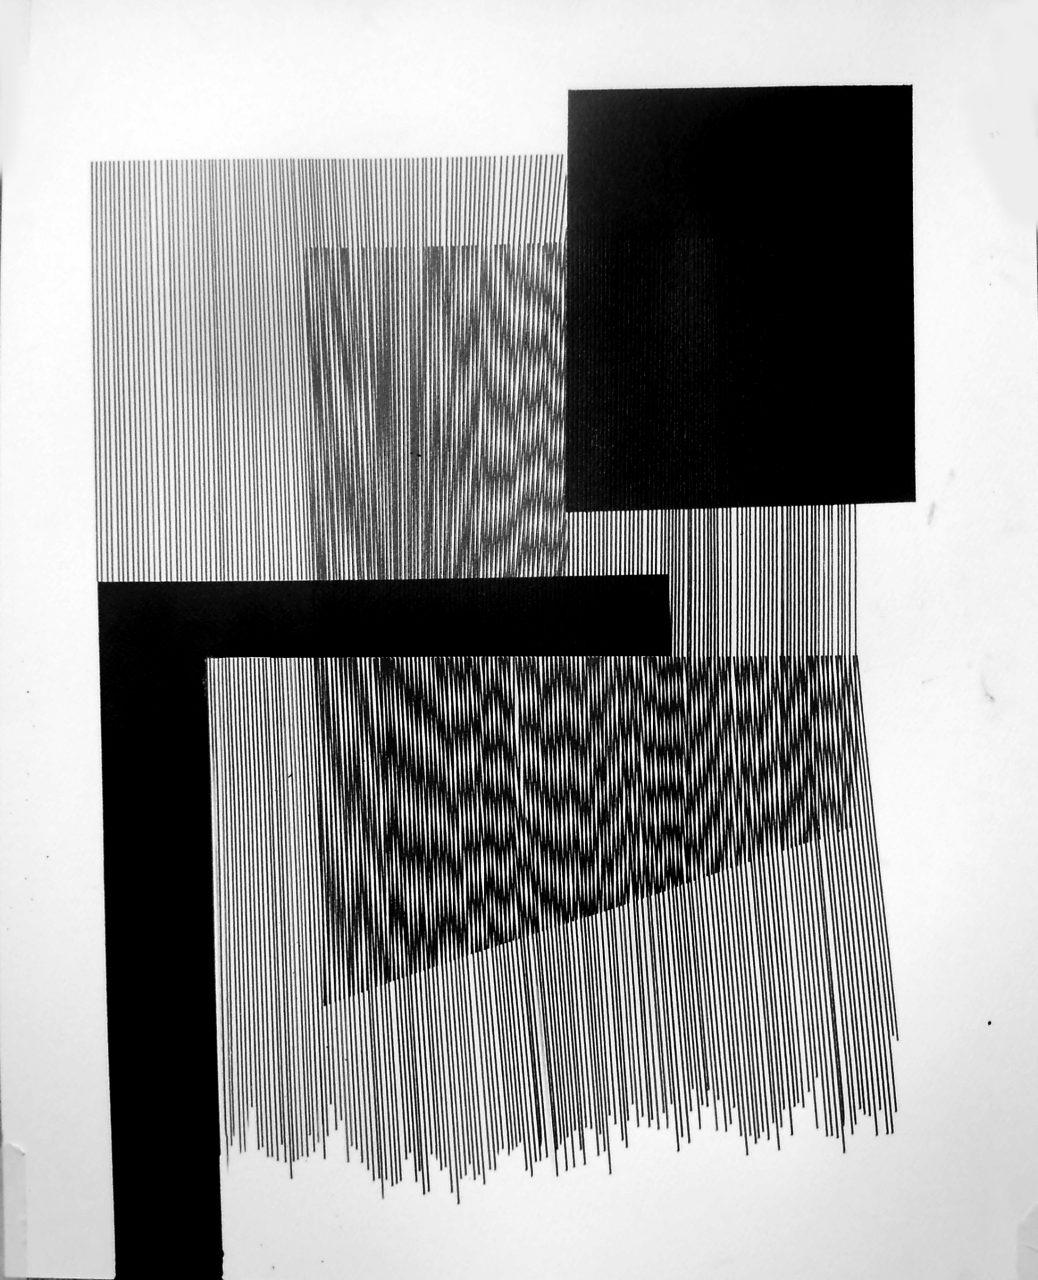 op173, ink on paper, 40x45cm